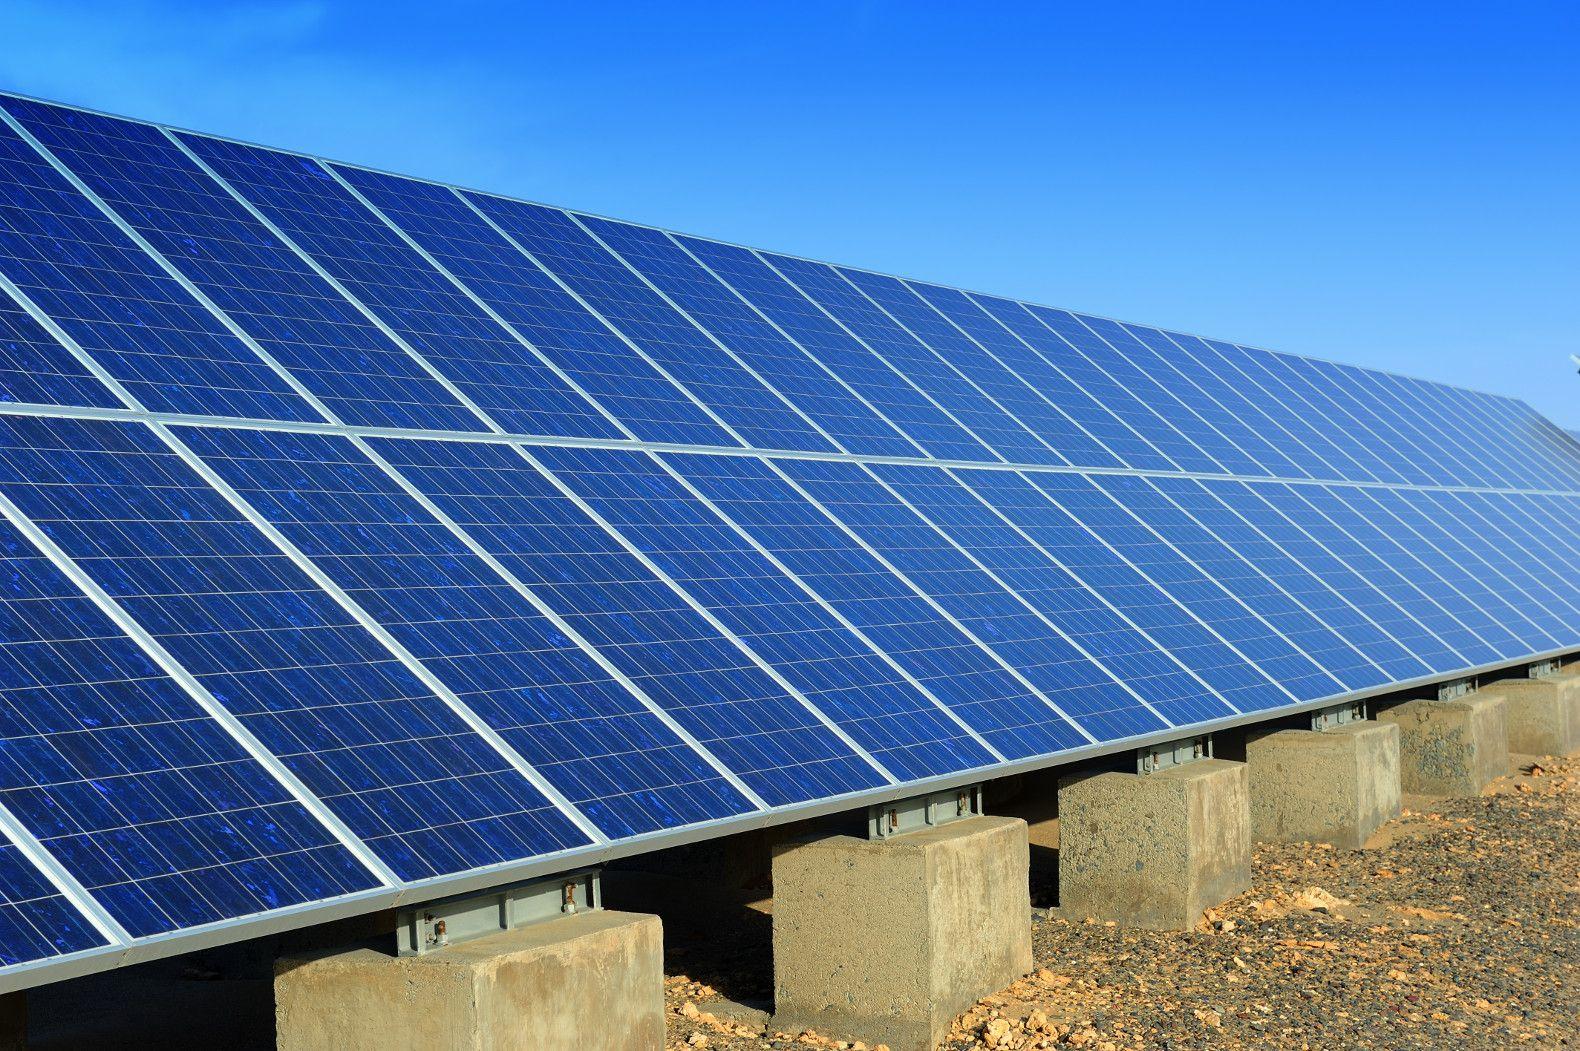 China Plans To Meet 2020 Emissions Goal By Tripling Solar Power Capacity Solar Solar Farm Used Solar Panels